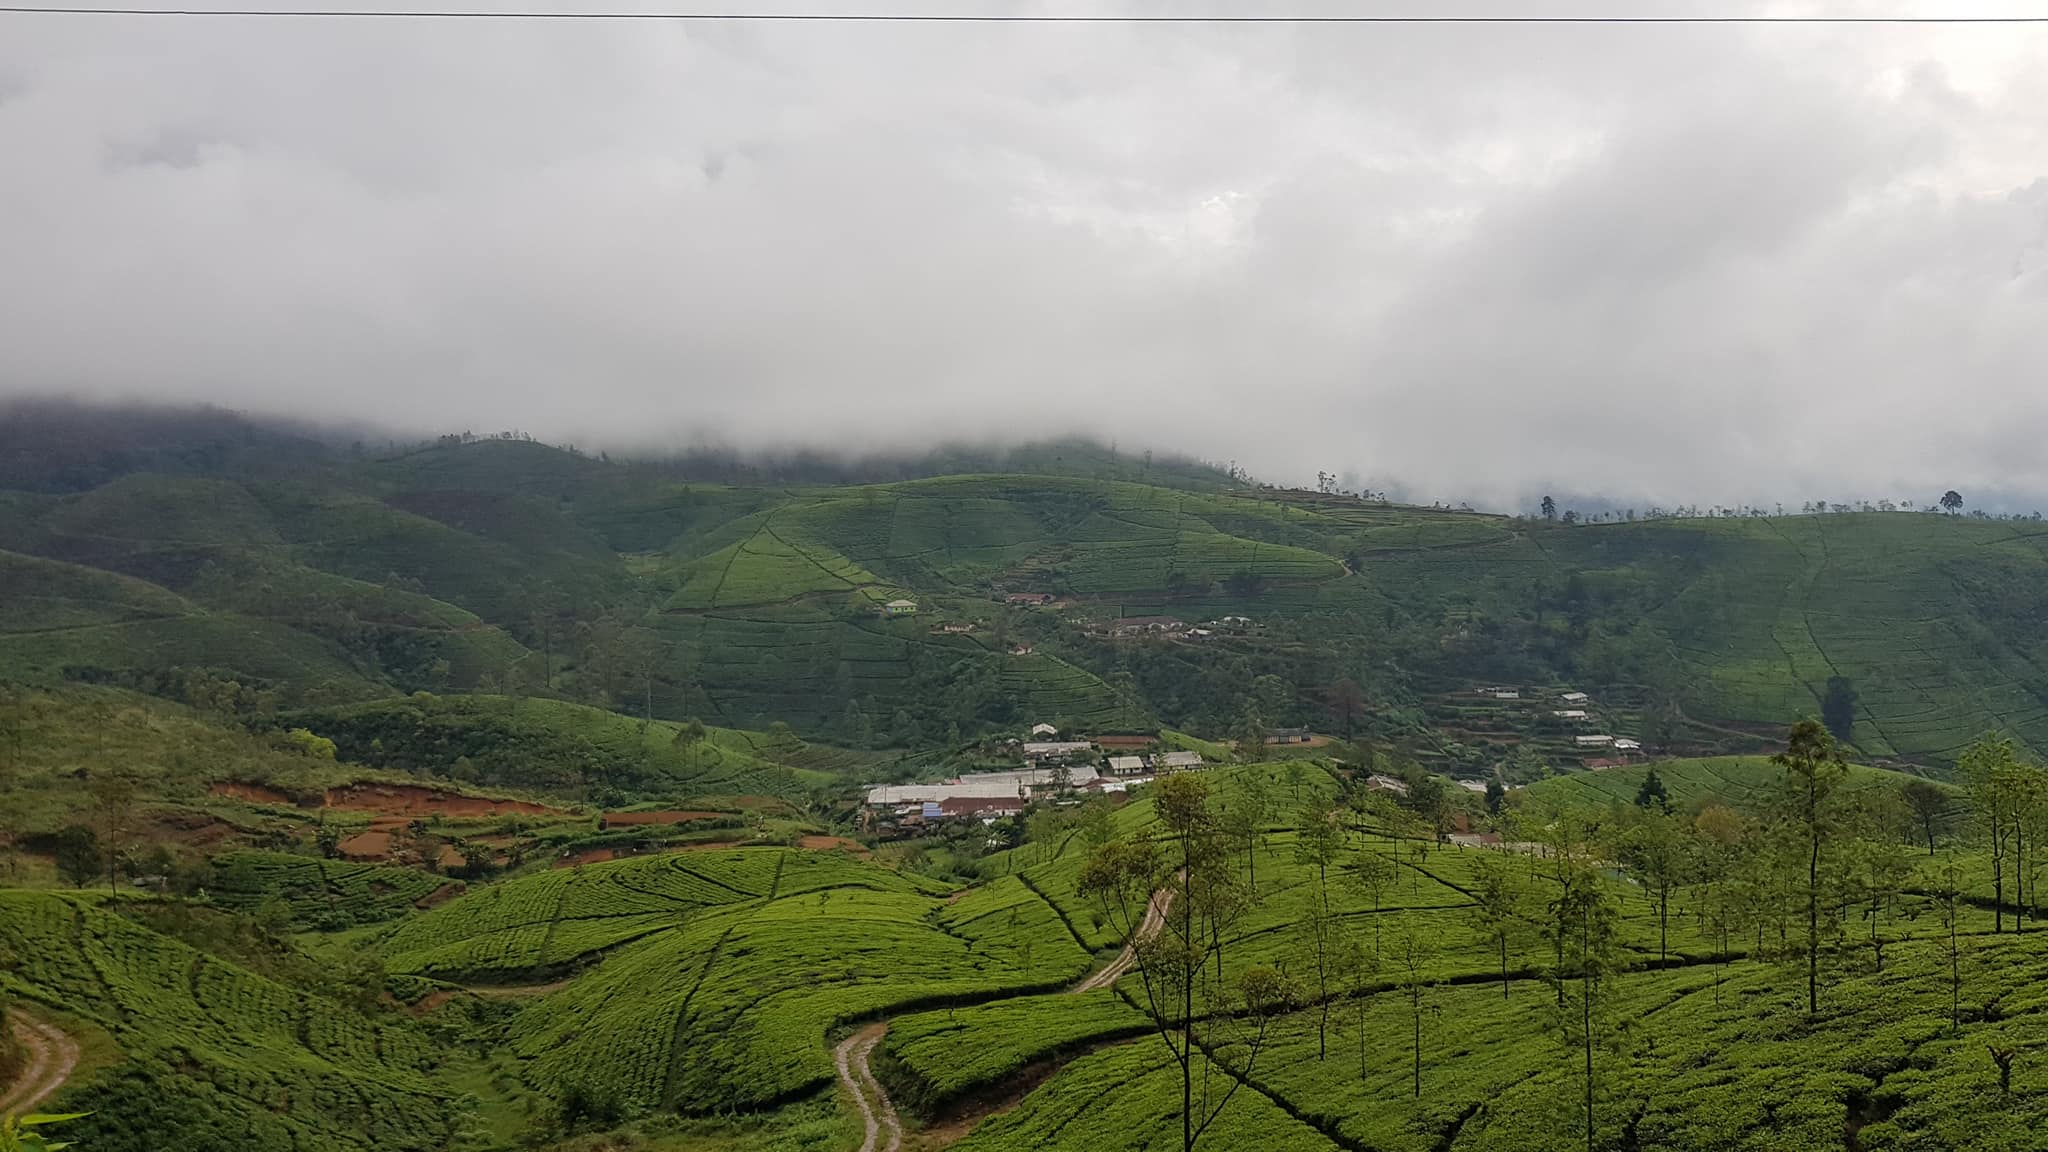 invite-to-paradise-sri-lanka-maldives-holiday-honeymoon-specialists-customer-guest-feedback-zane-lisa-butcher-98-acres-tea-plantation-hills.jpg